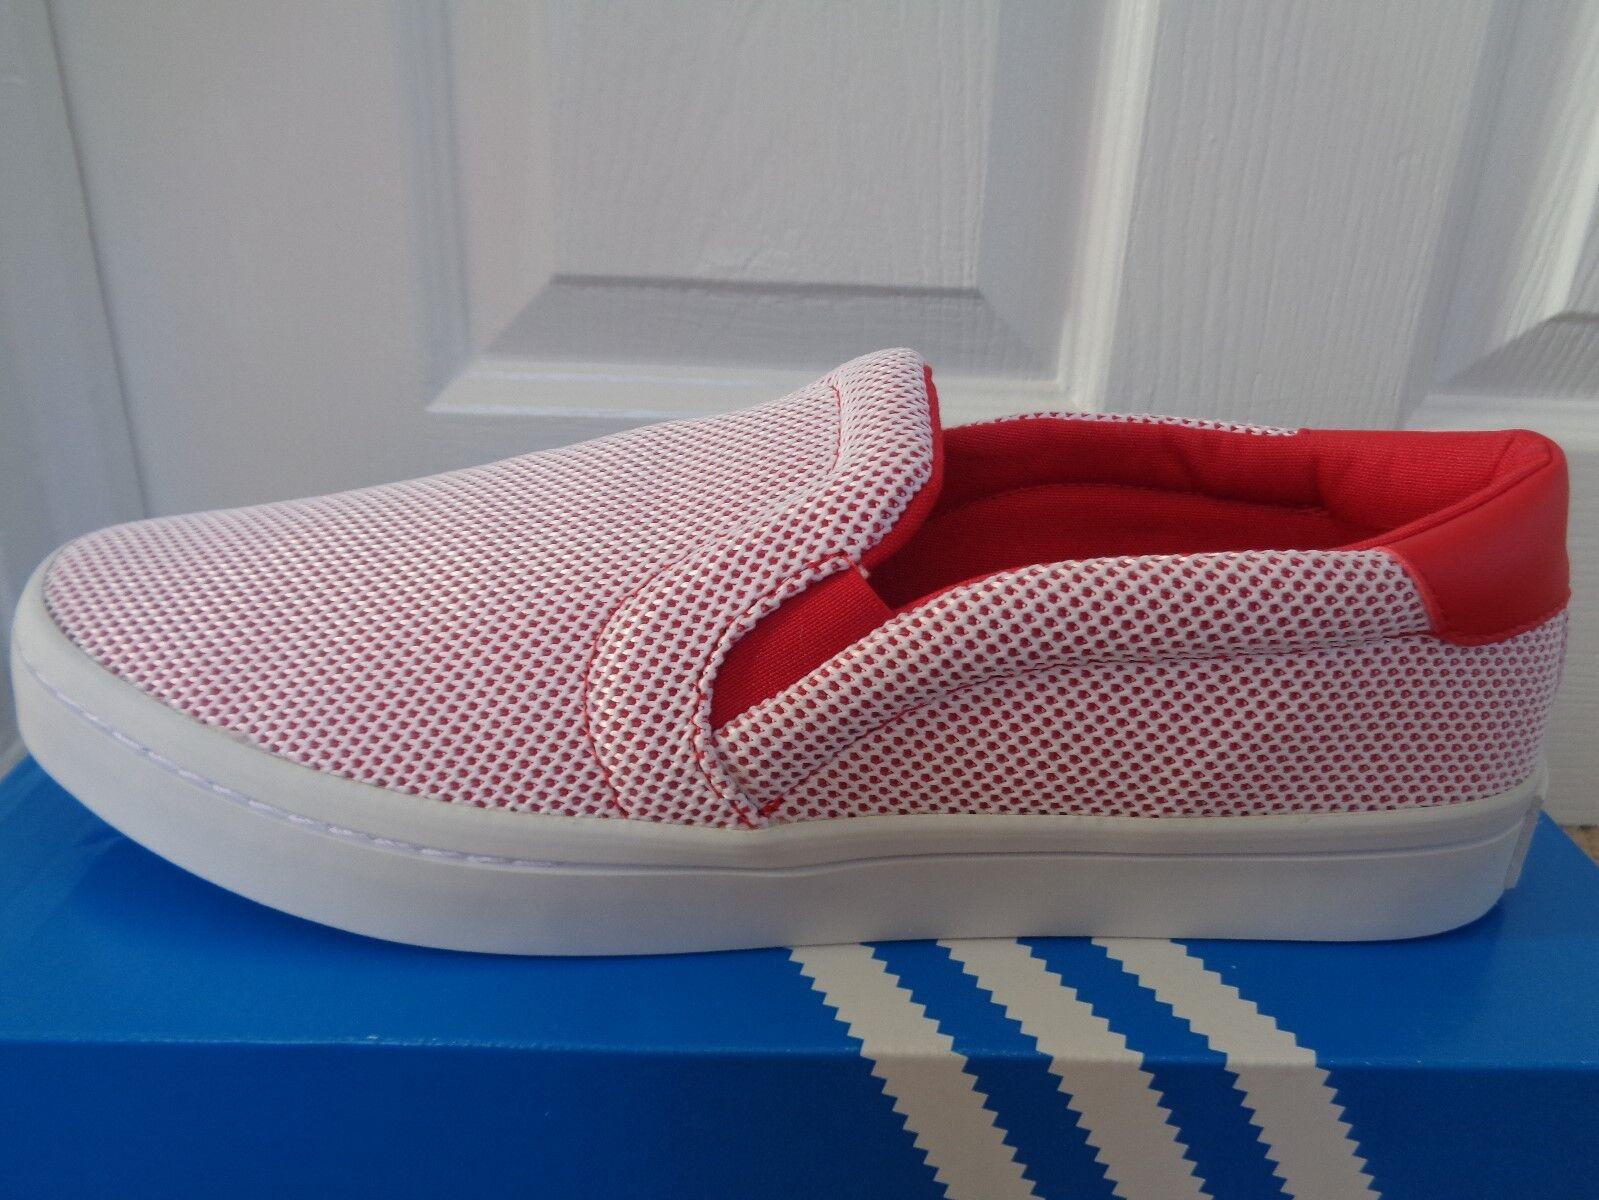 Adidas courtvantage Adicolor EU Chaussures Baskets S81871 UK 10 EU Adicolor 44 2/3 US 10.5 New 385dee